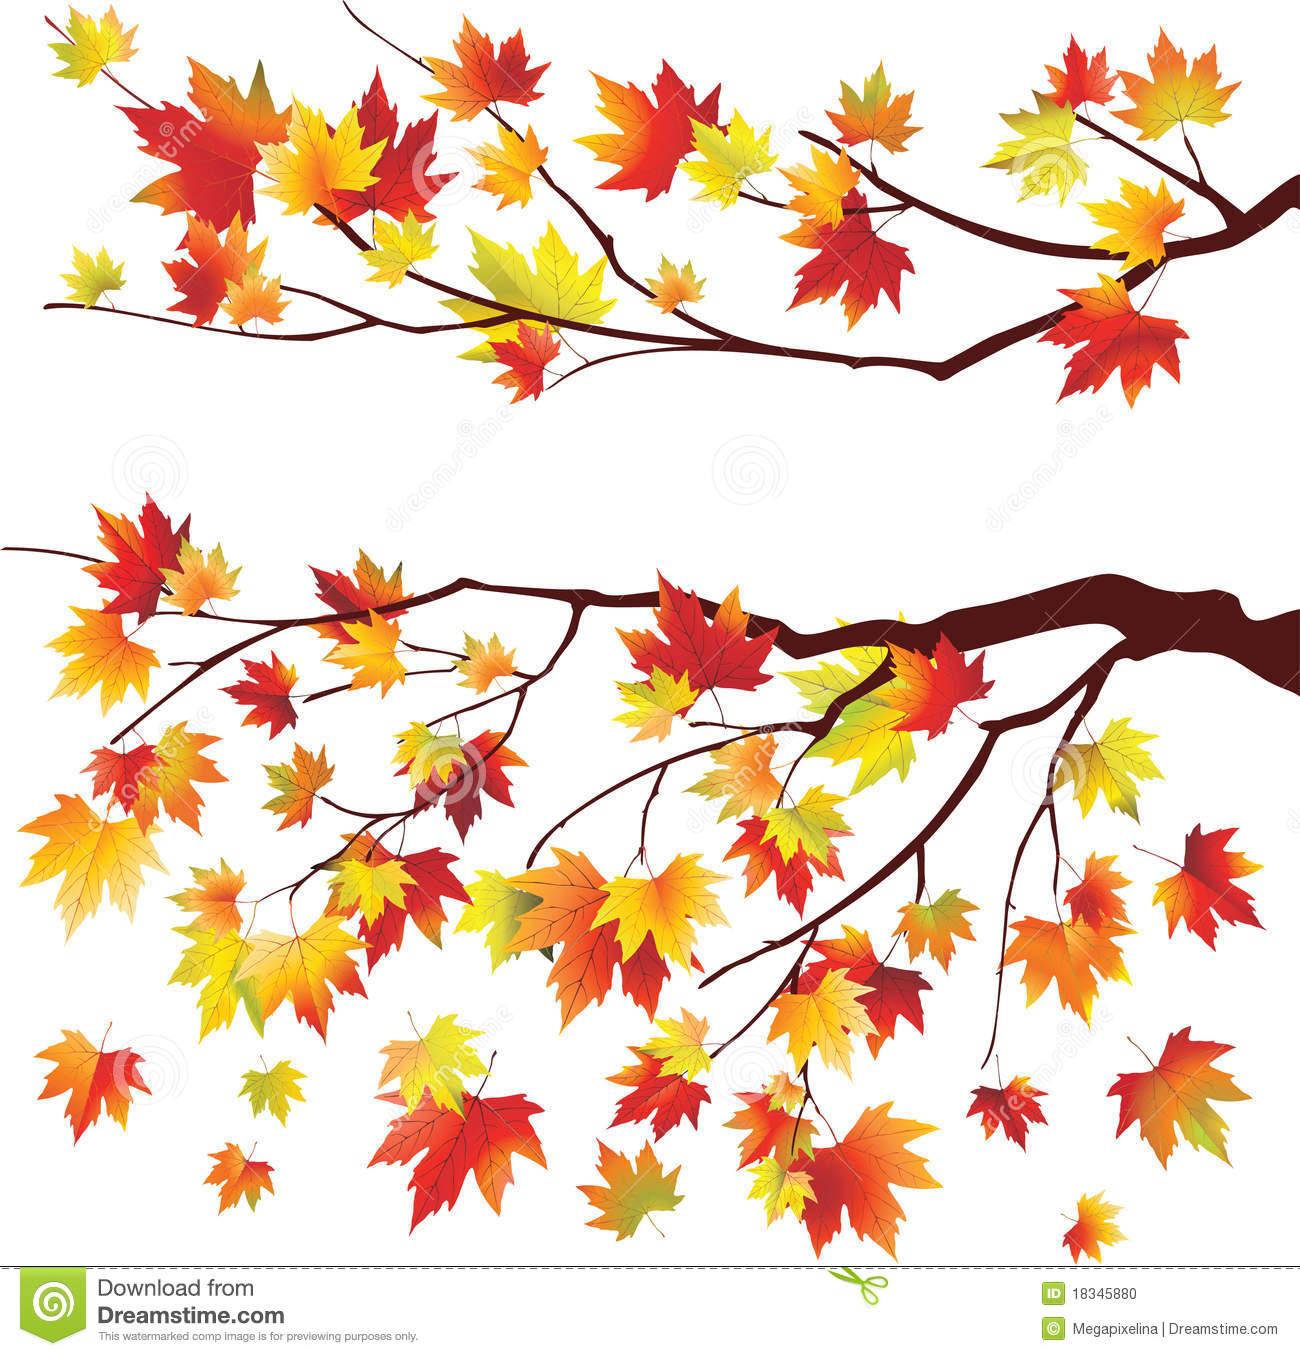 Chalkboard art clipart tree autumn picture transparent library Autumn tree clip art - ClipartFest picture transparent library